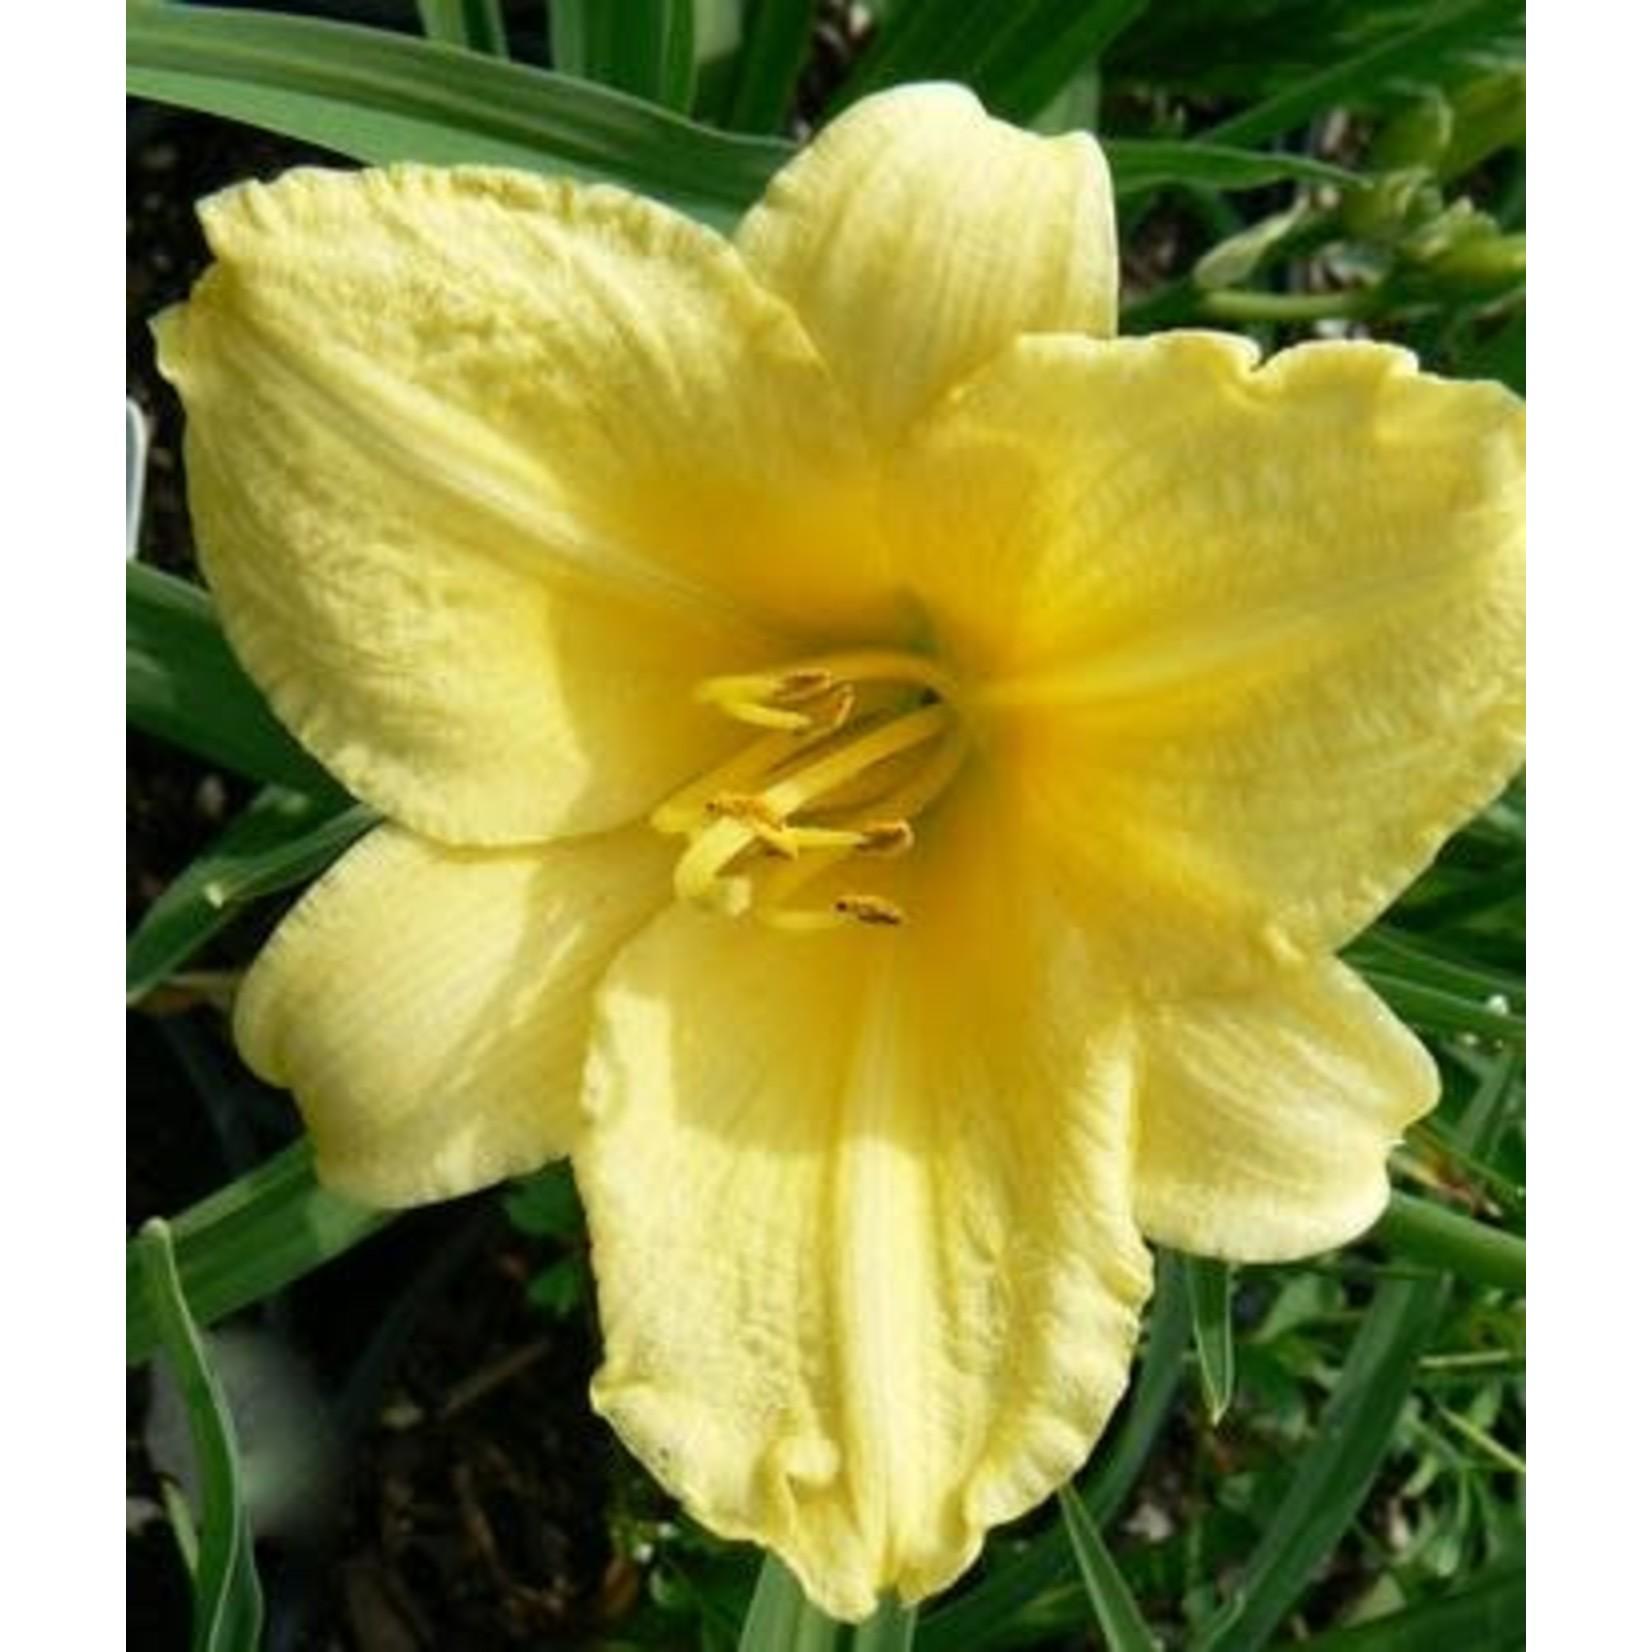 Daylily - Hemerocallis 'happy returns'